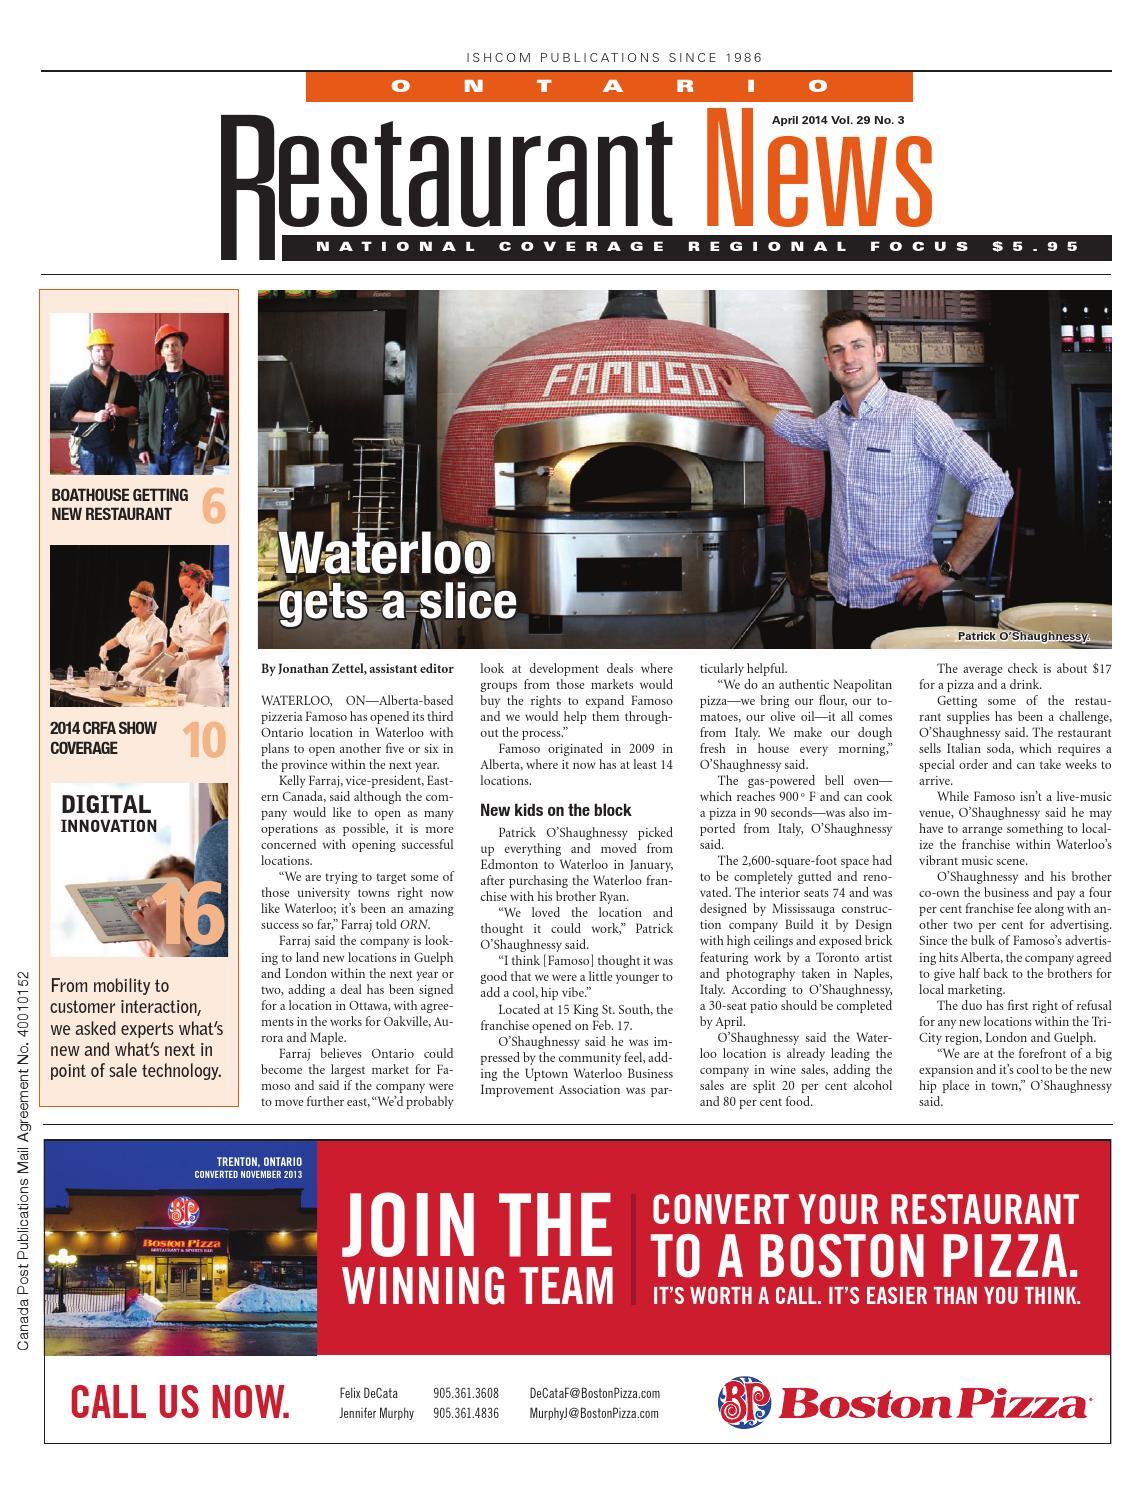 Ontario Restaurant News - April 2014 by Ishcom Publications - issuu